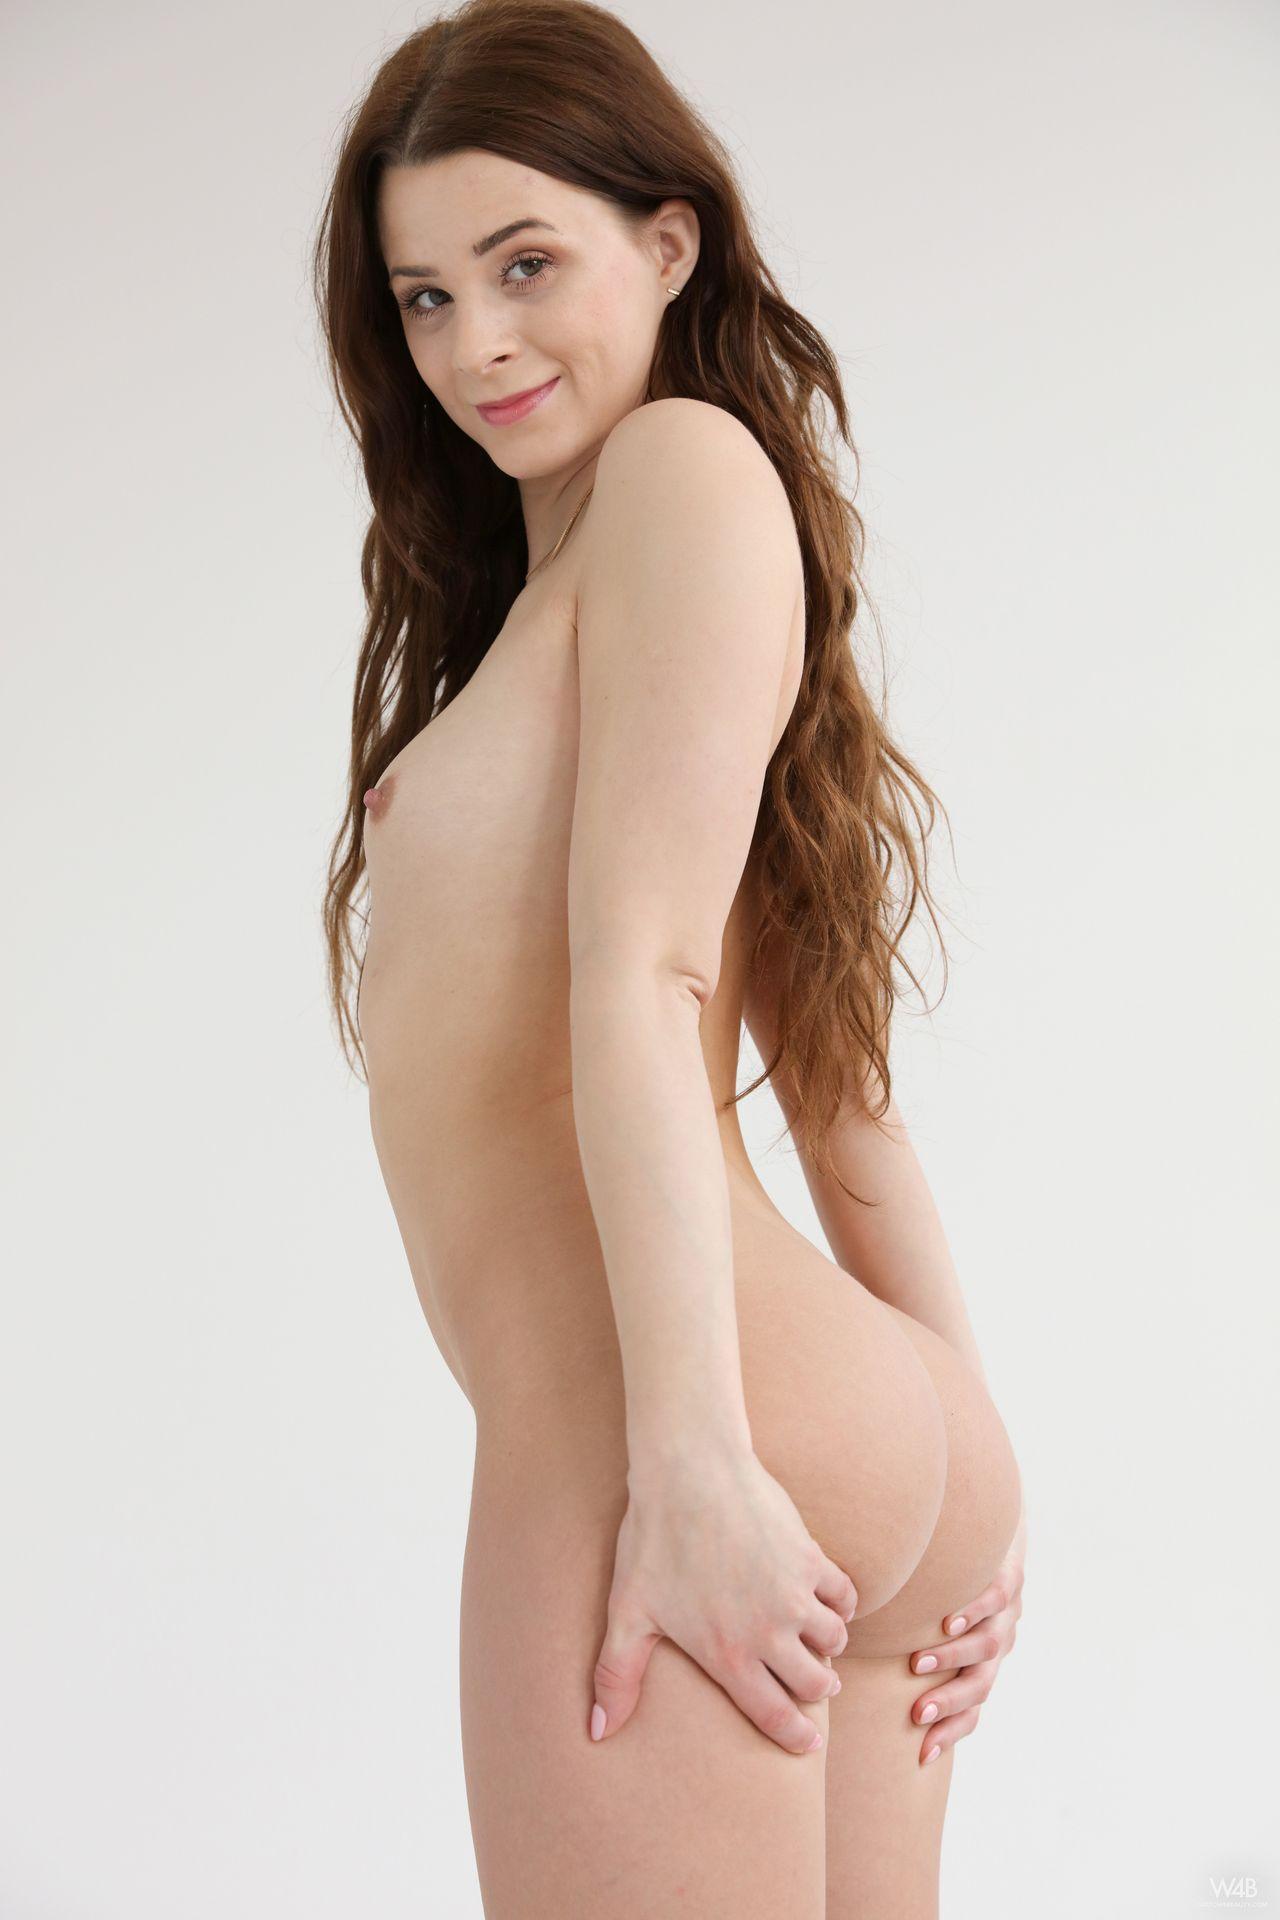 Lu Divine's Nude Casting 0002